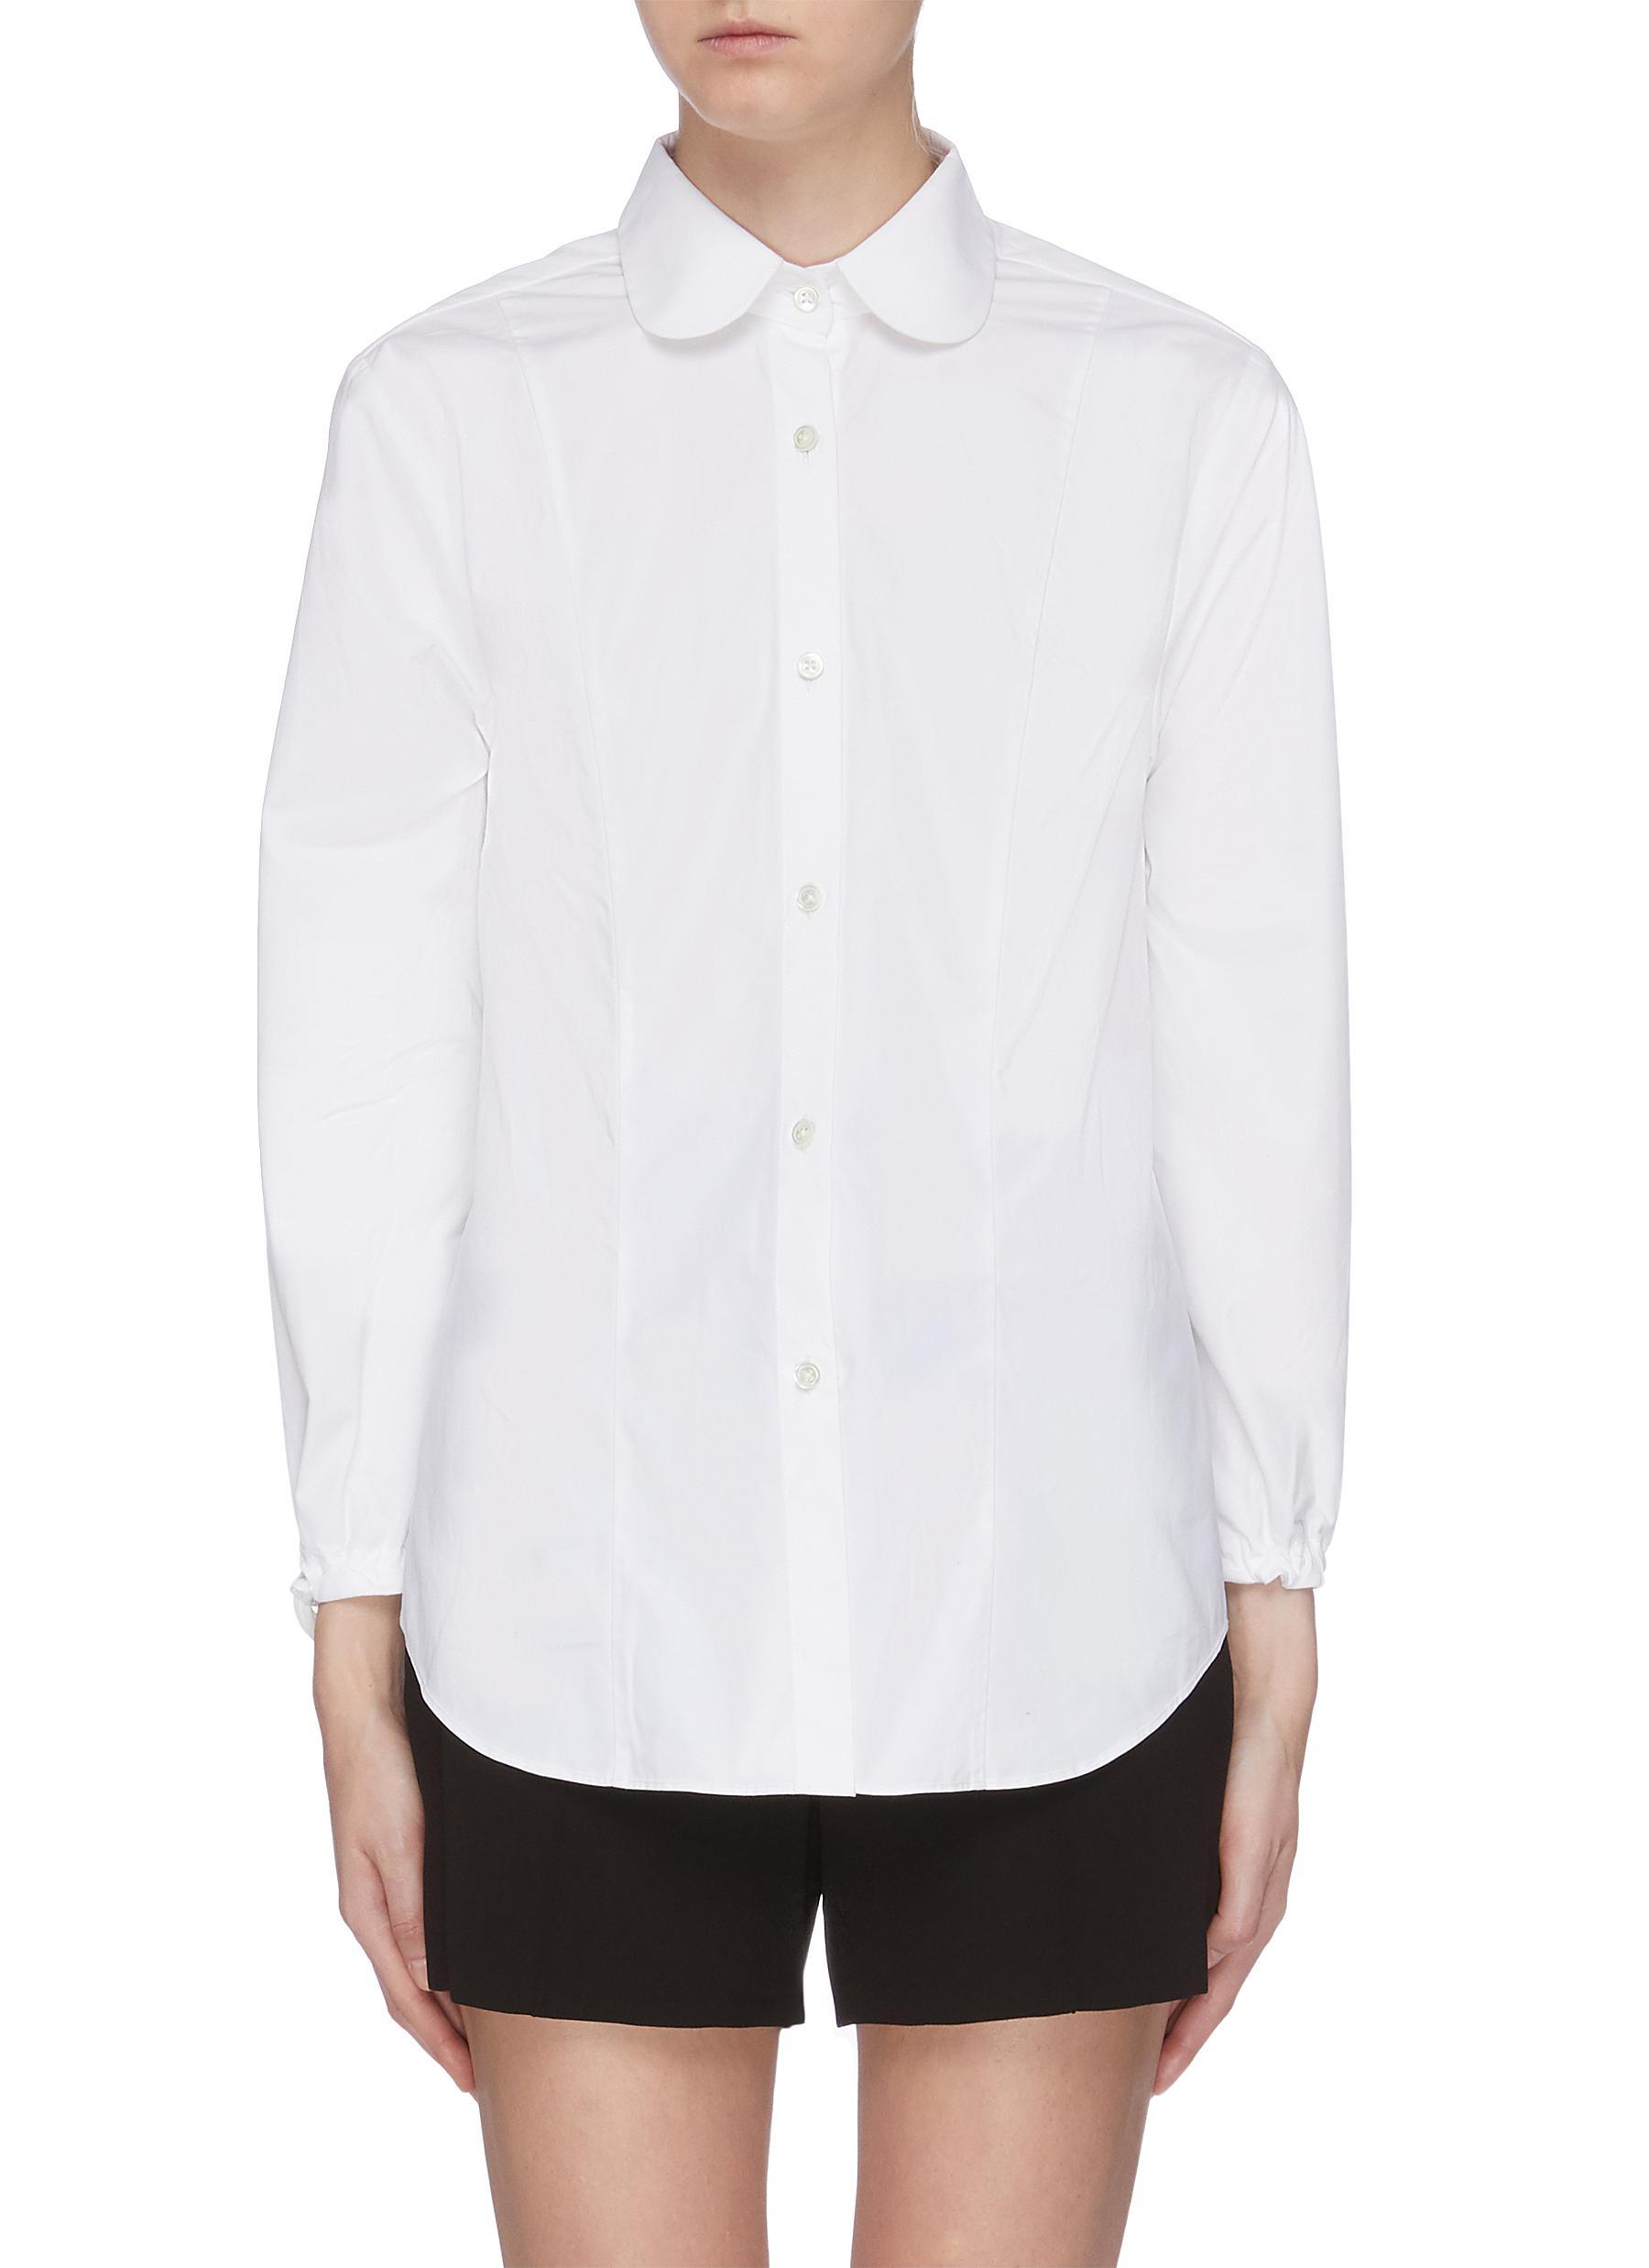 Photo of Shushu/Tong Clothing Tops online sale